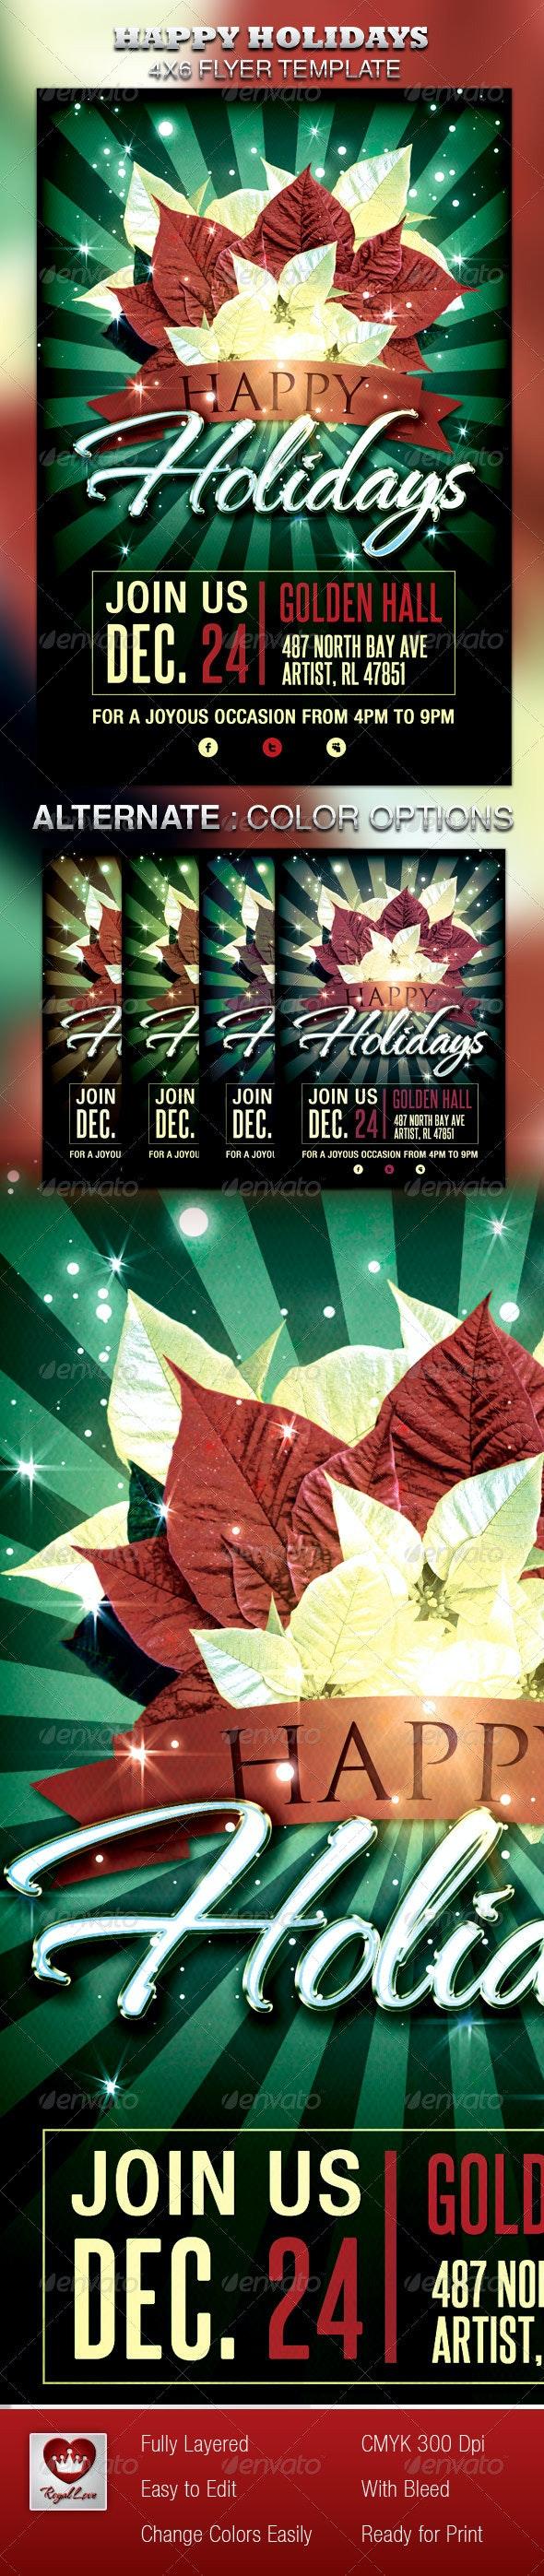 Happy Holidays Flyer - Holidays Events